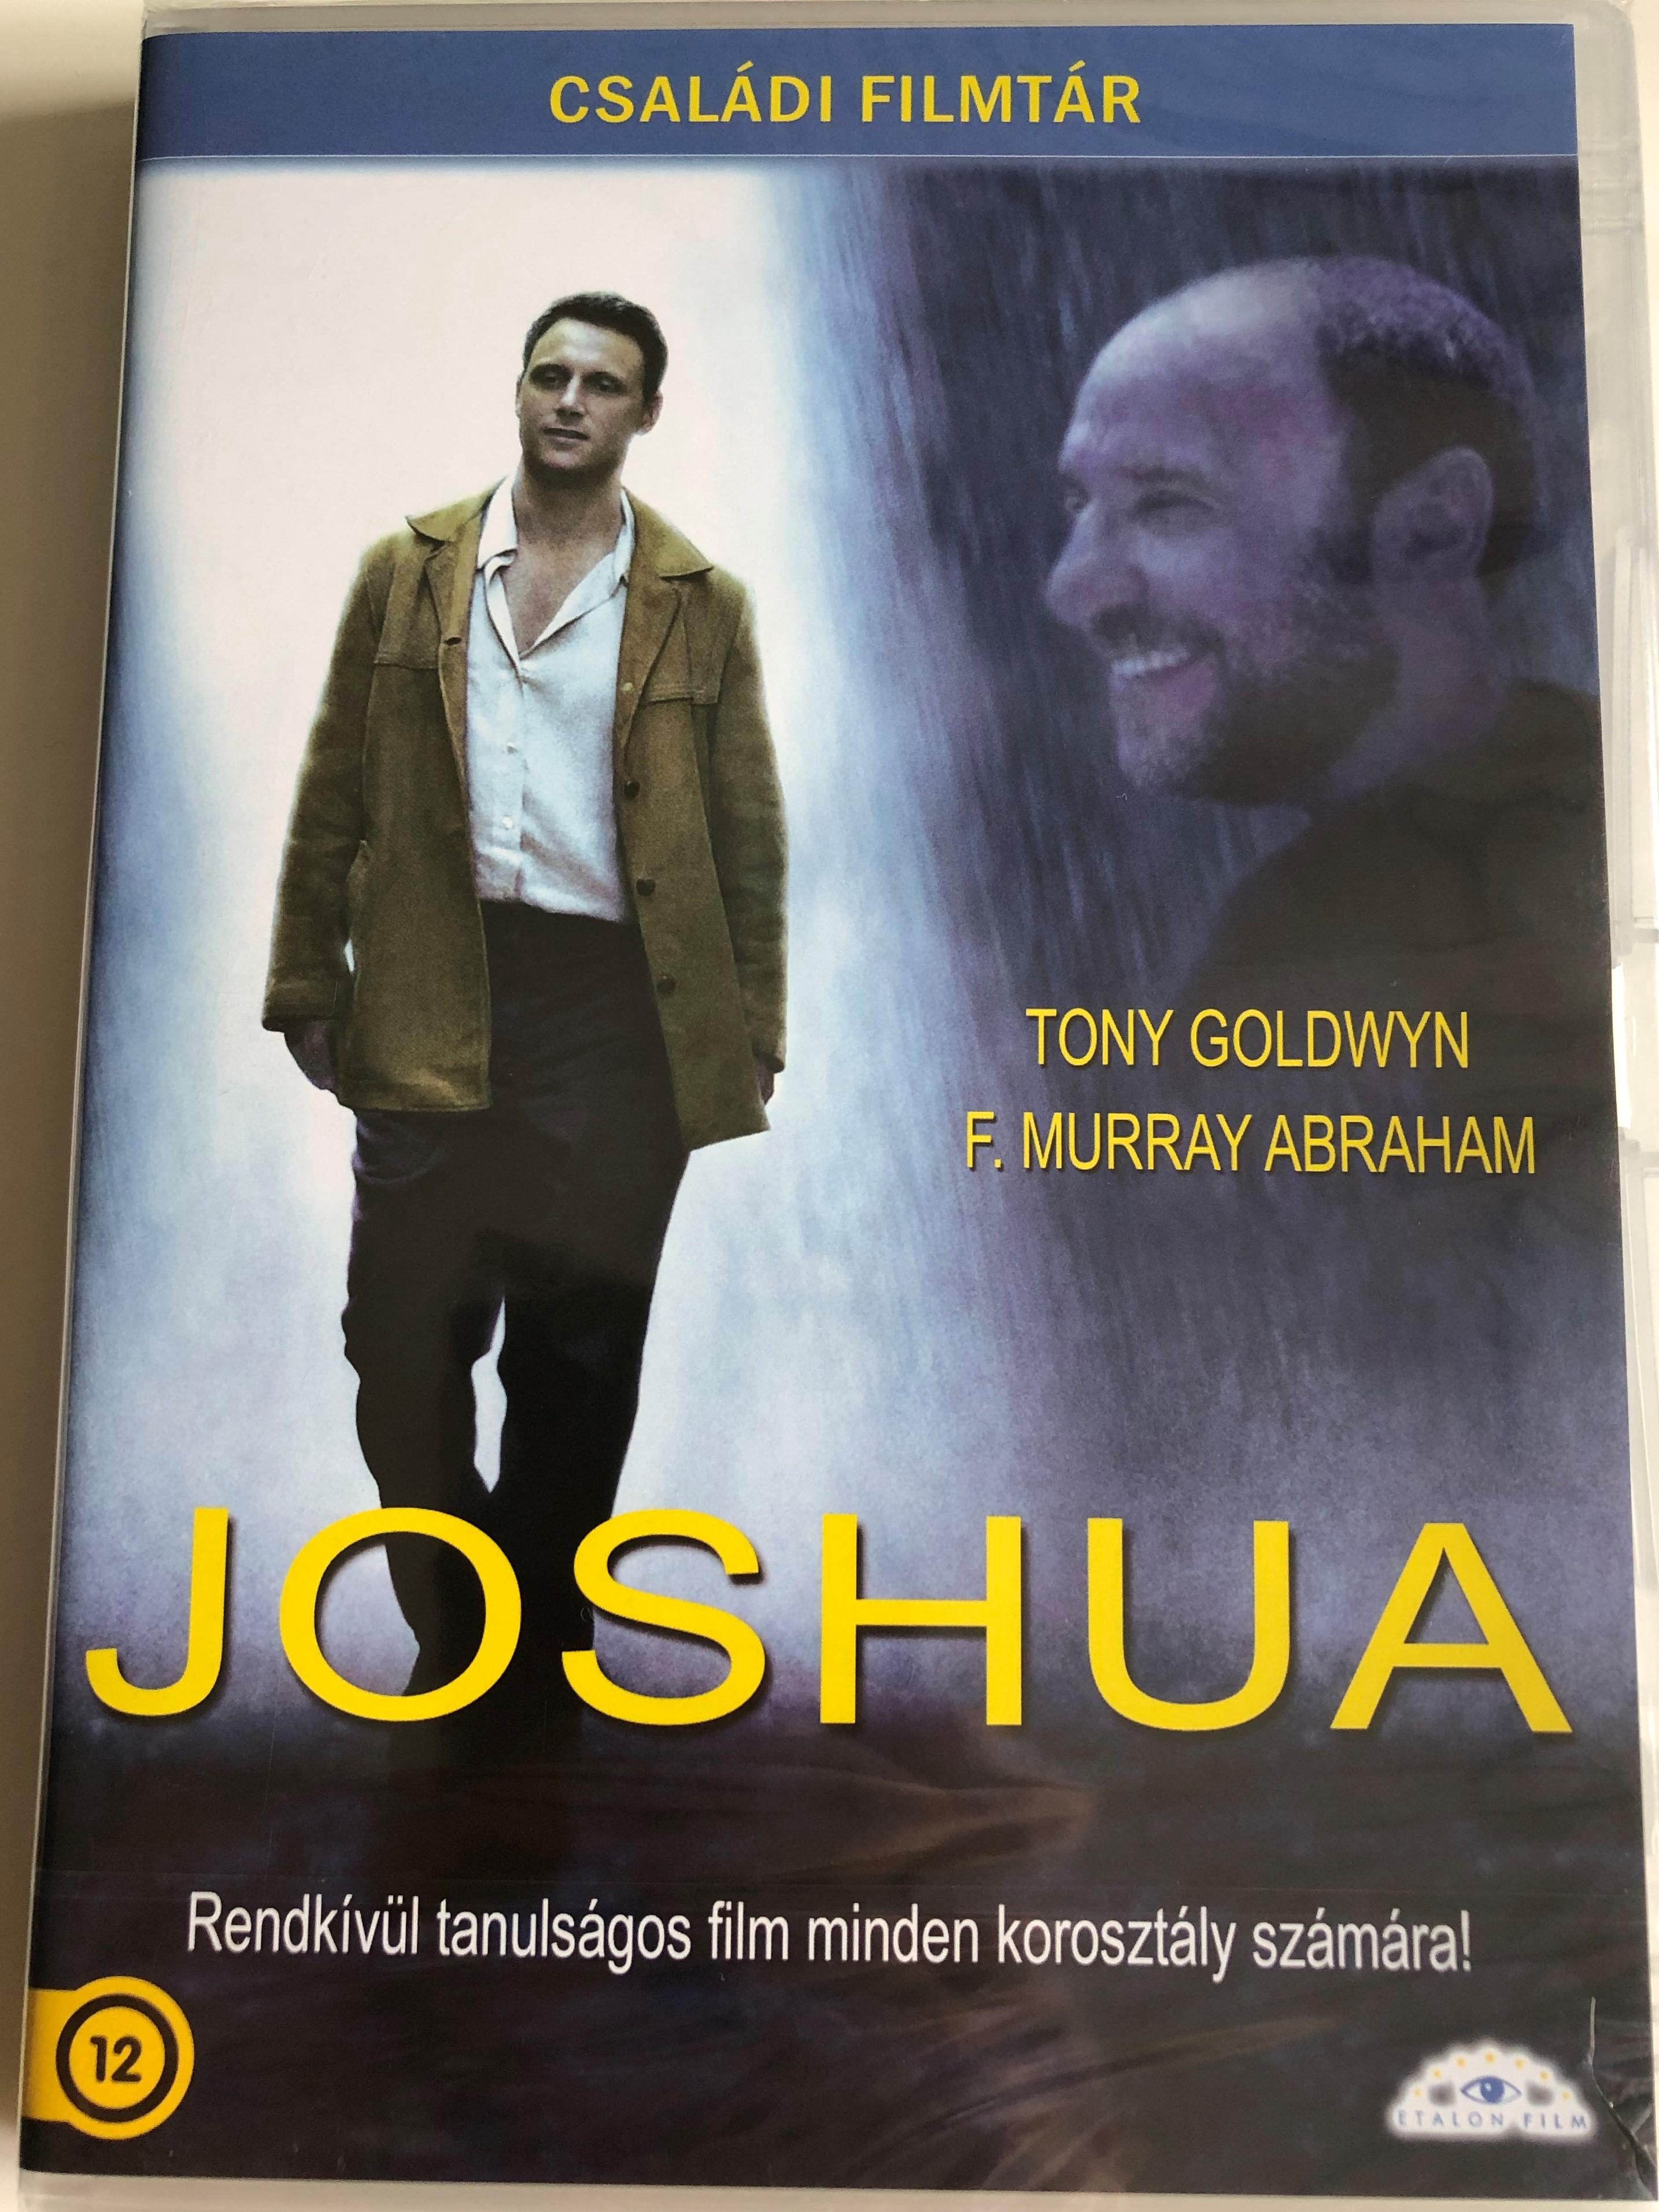 joshua-dvd-2002-directed-by-jon-purdy-starring-tony-goldwyn-f.-murray-abraham-giancarlo-giannini-1-.jpg